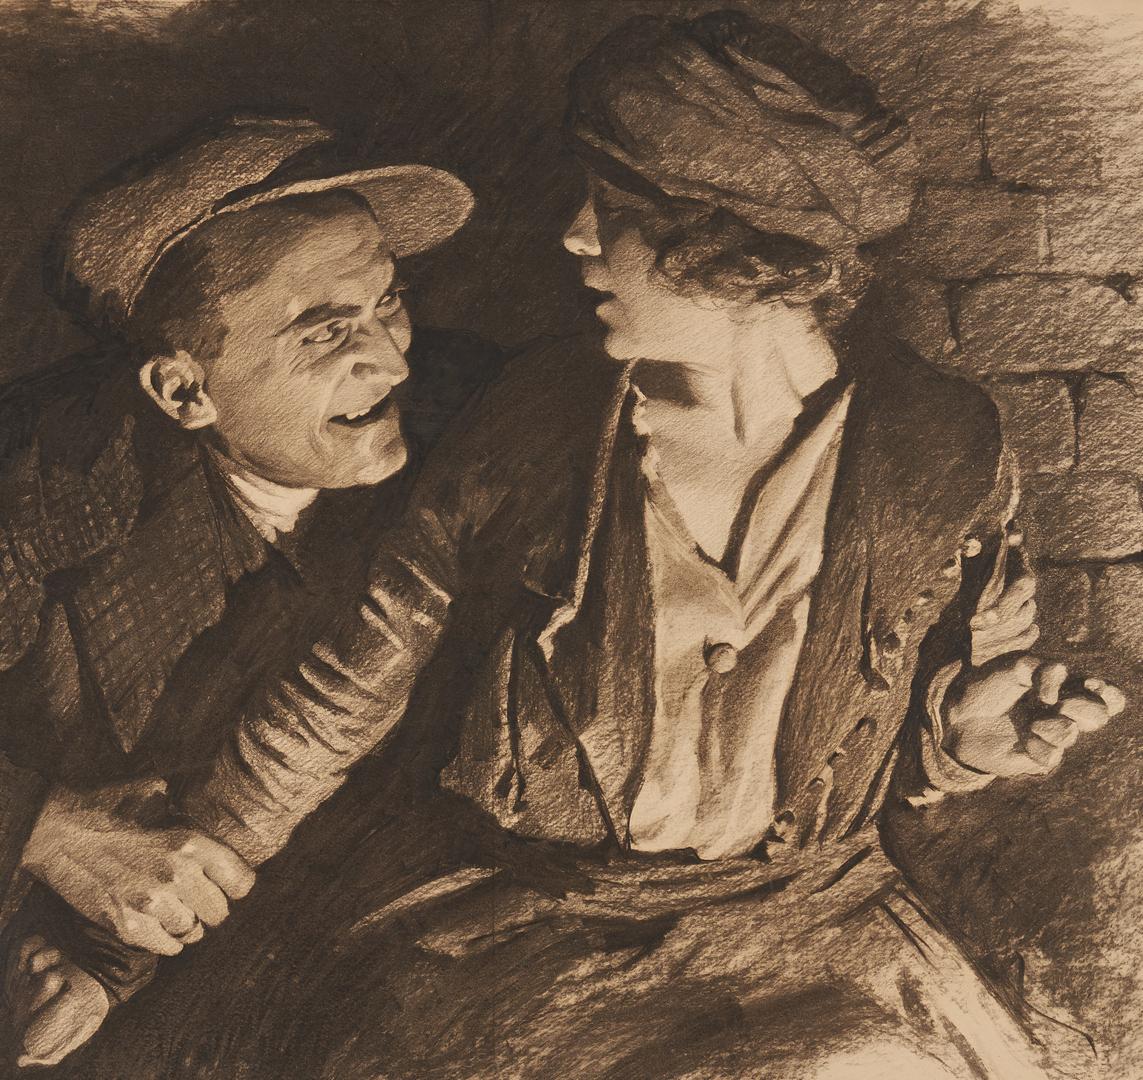 Lot 535: 2 Early 20th C. Illustrations by Bracker, Brehm